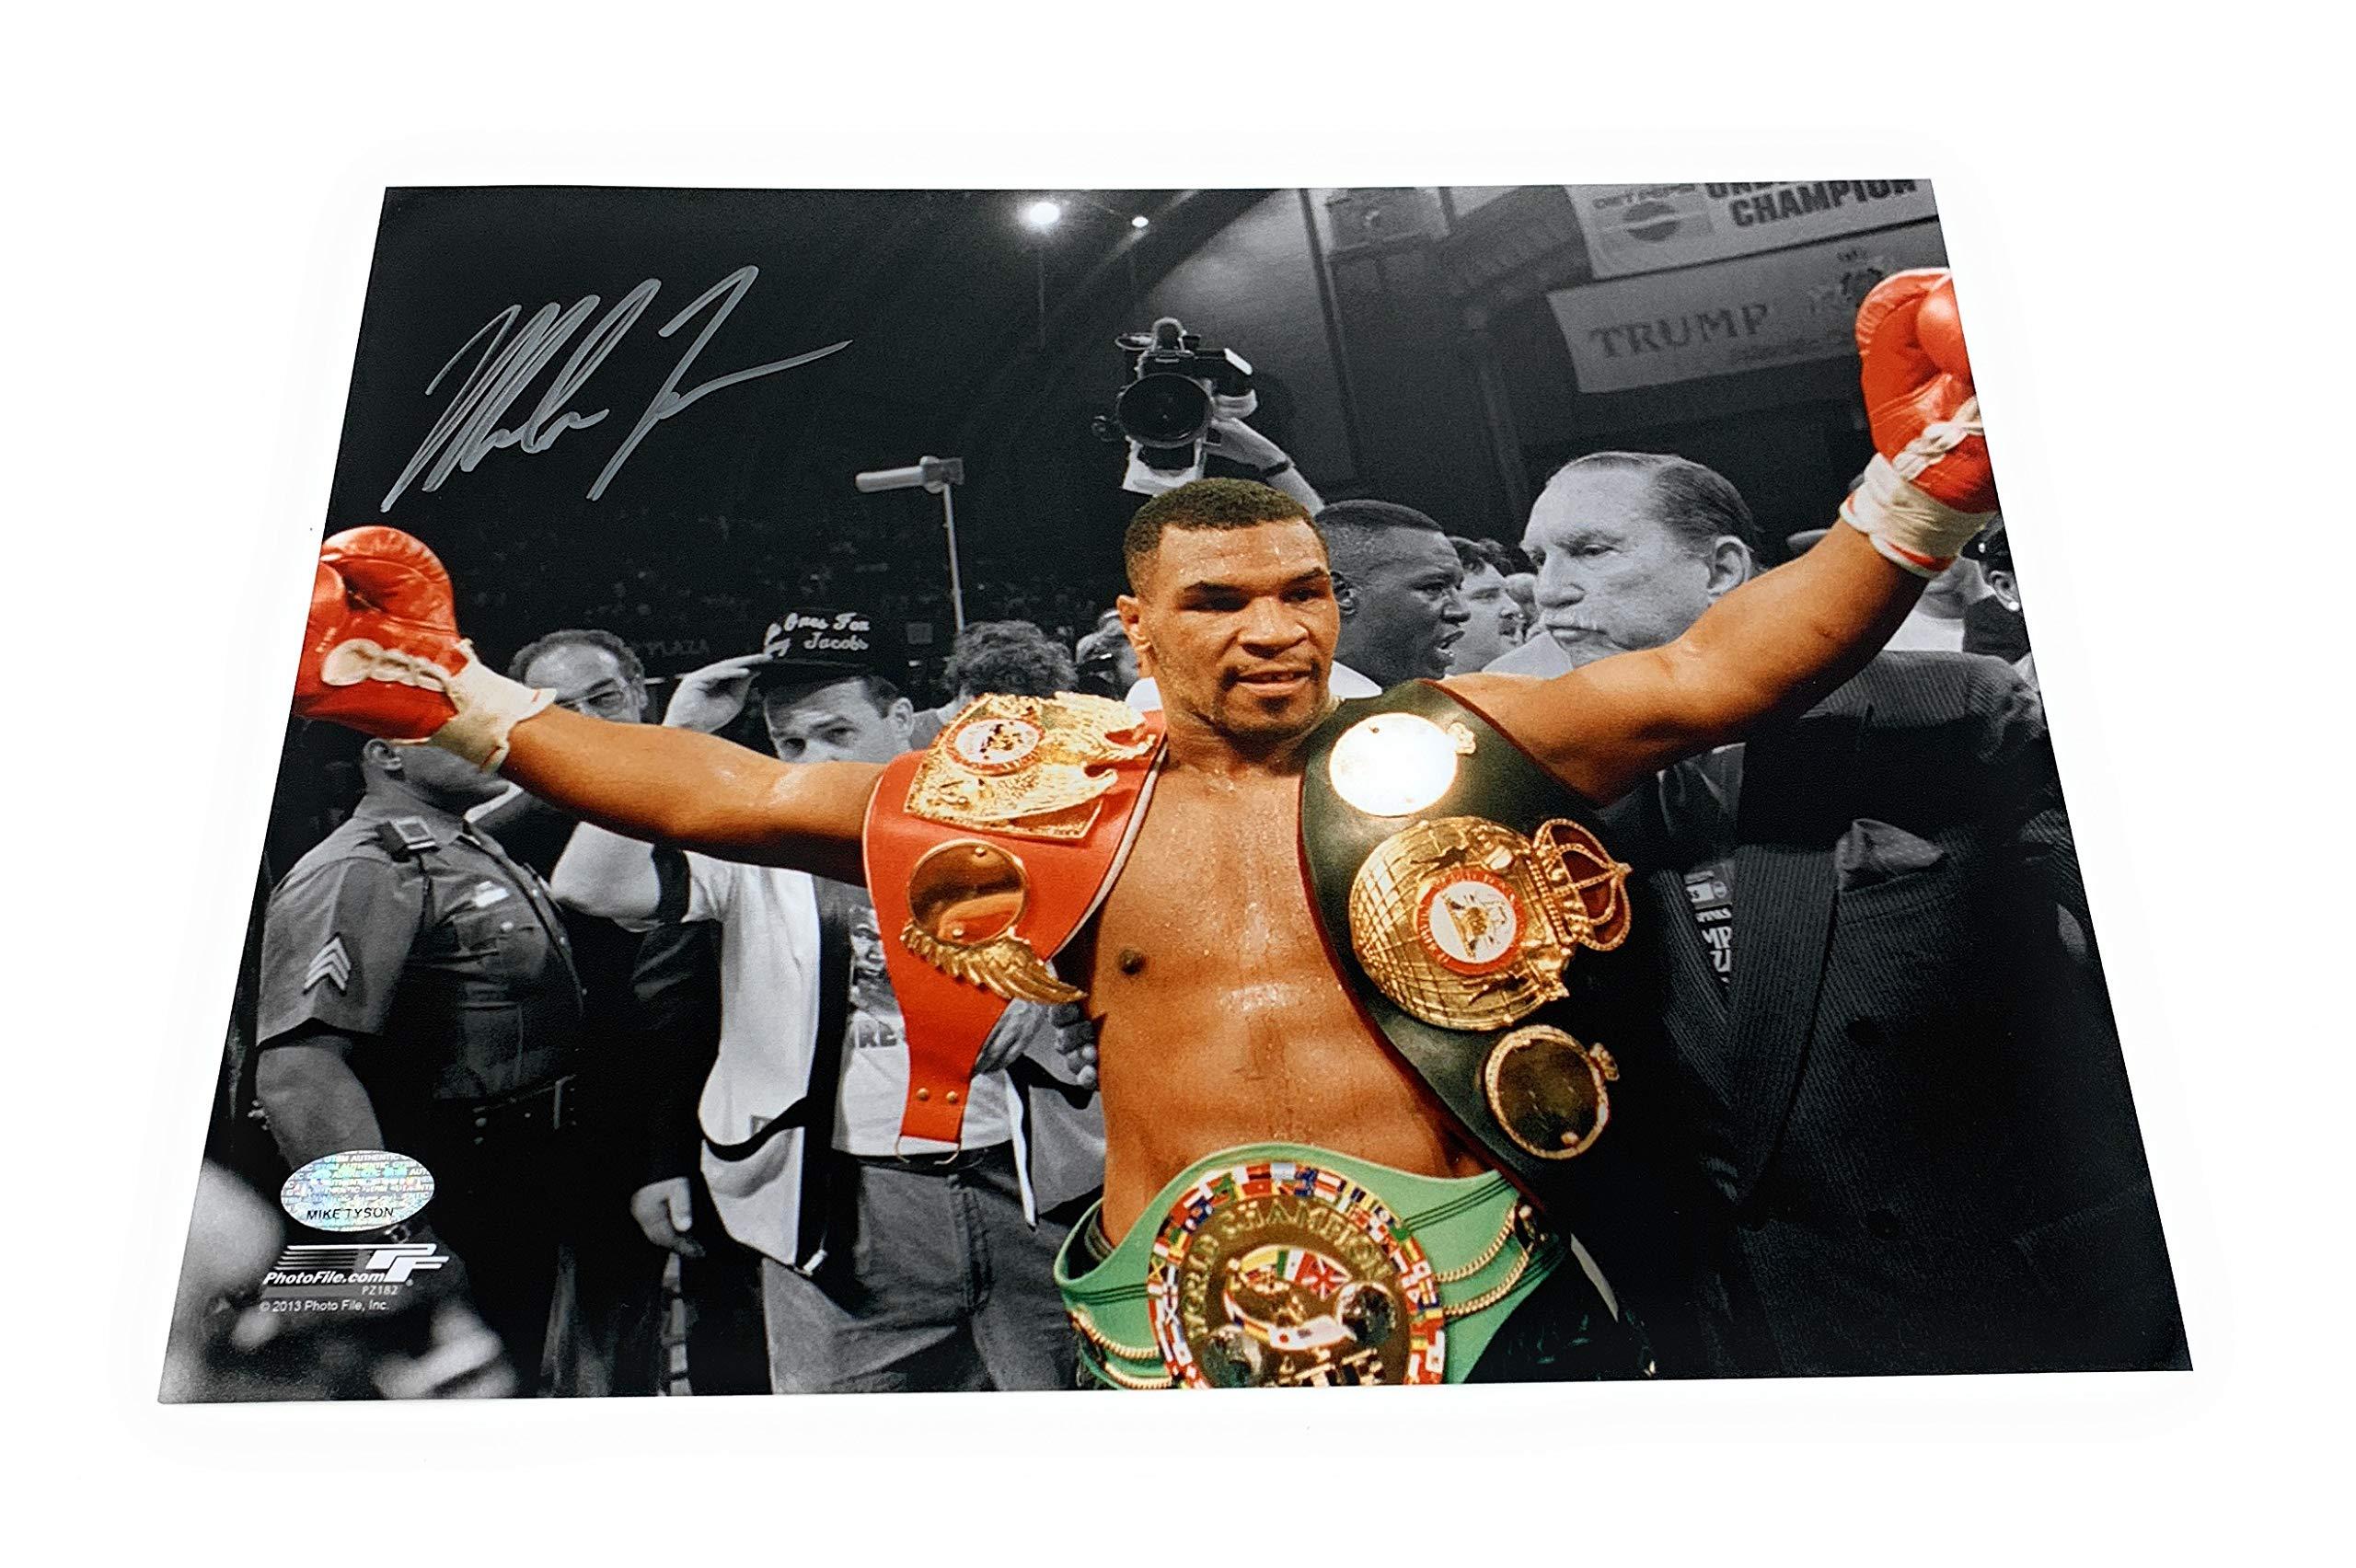 Mike Tyson Boxing Signed Autograph 8x10 Photo Photograph Belts GTSM Tyson Hologram Certified